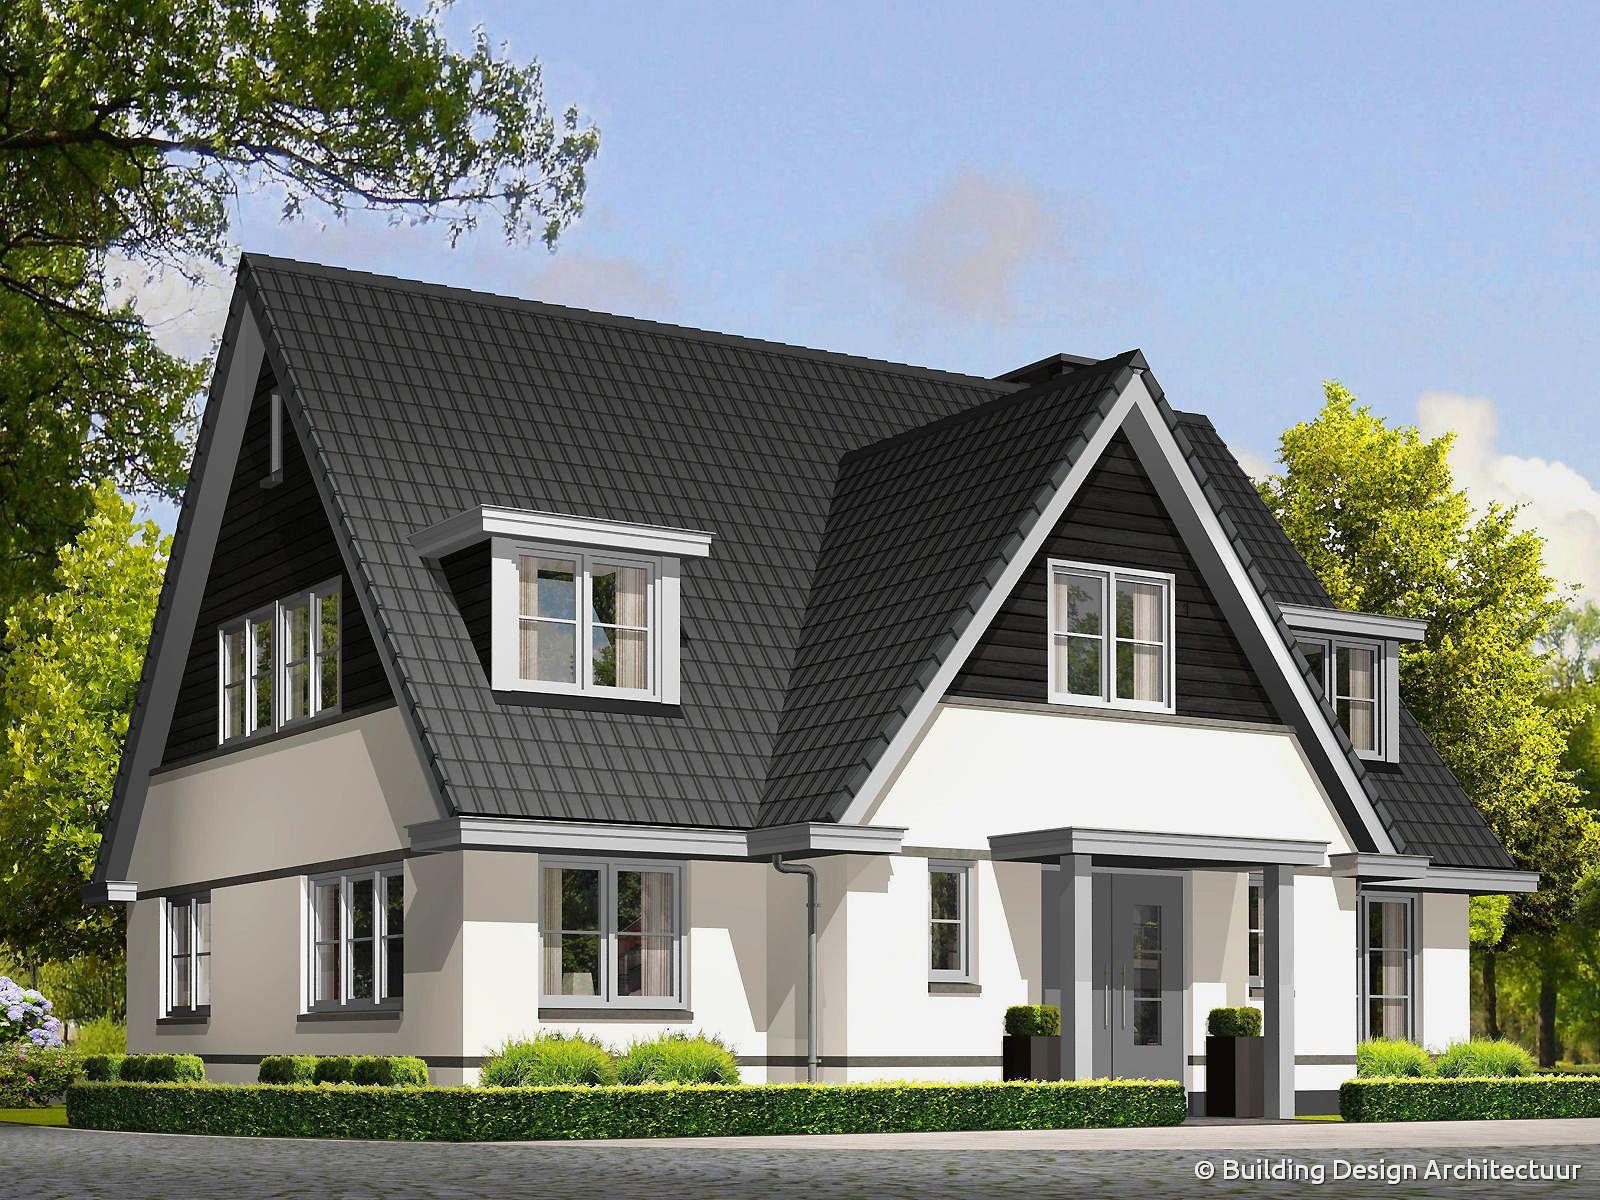 Building design architectuur huizen pinterest huizen for Huizen architectuur